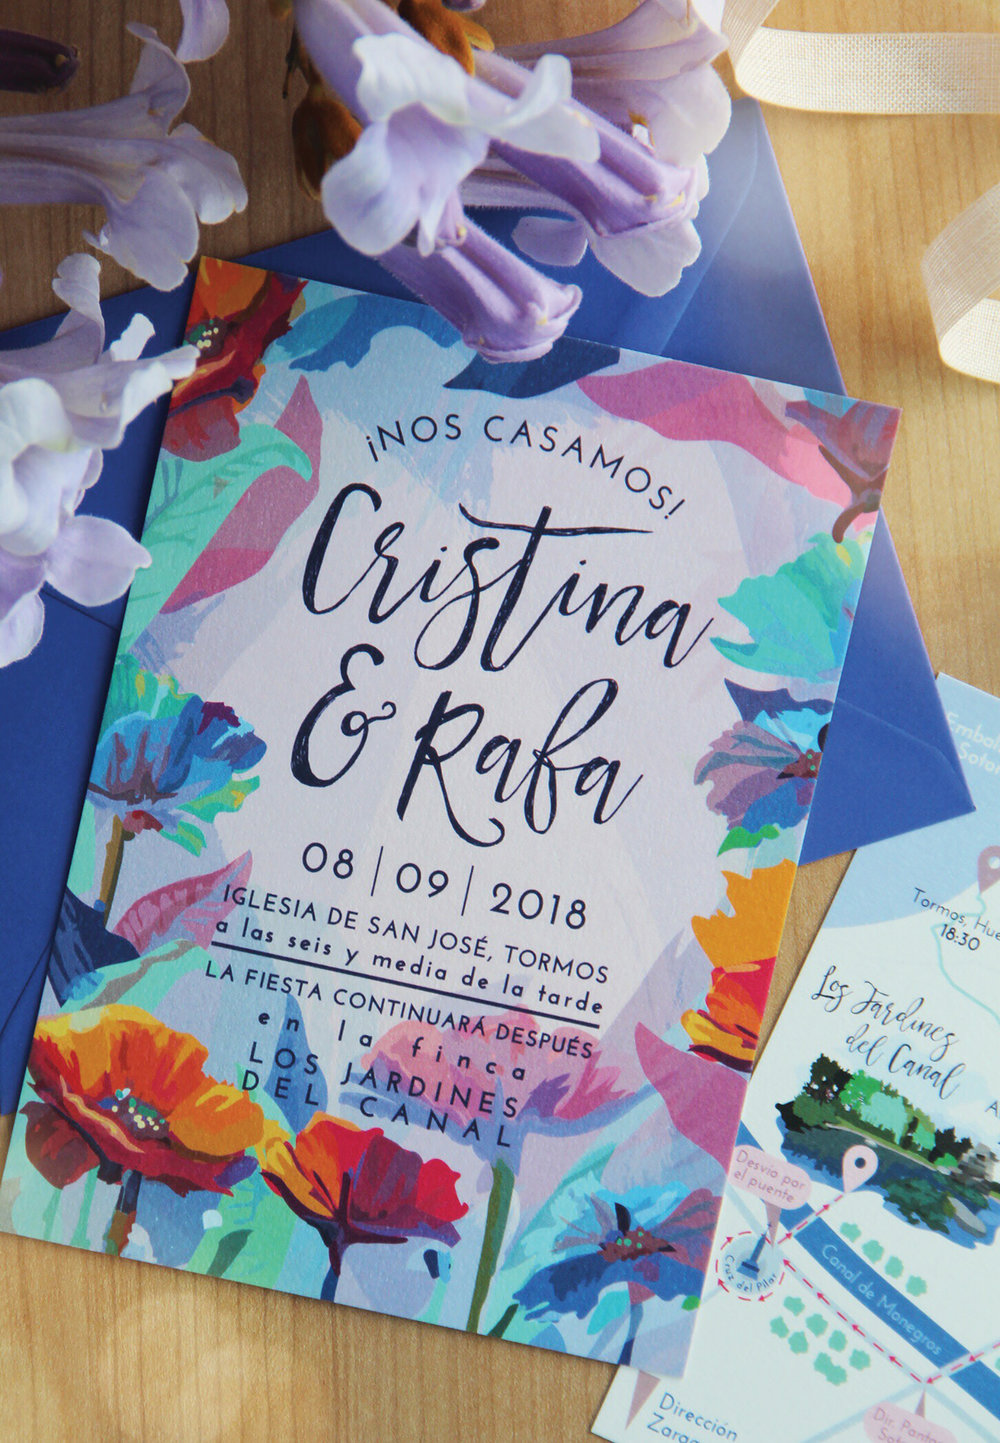 Invitación_Cristina&Rafa_RGB.jpg